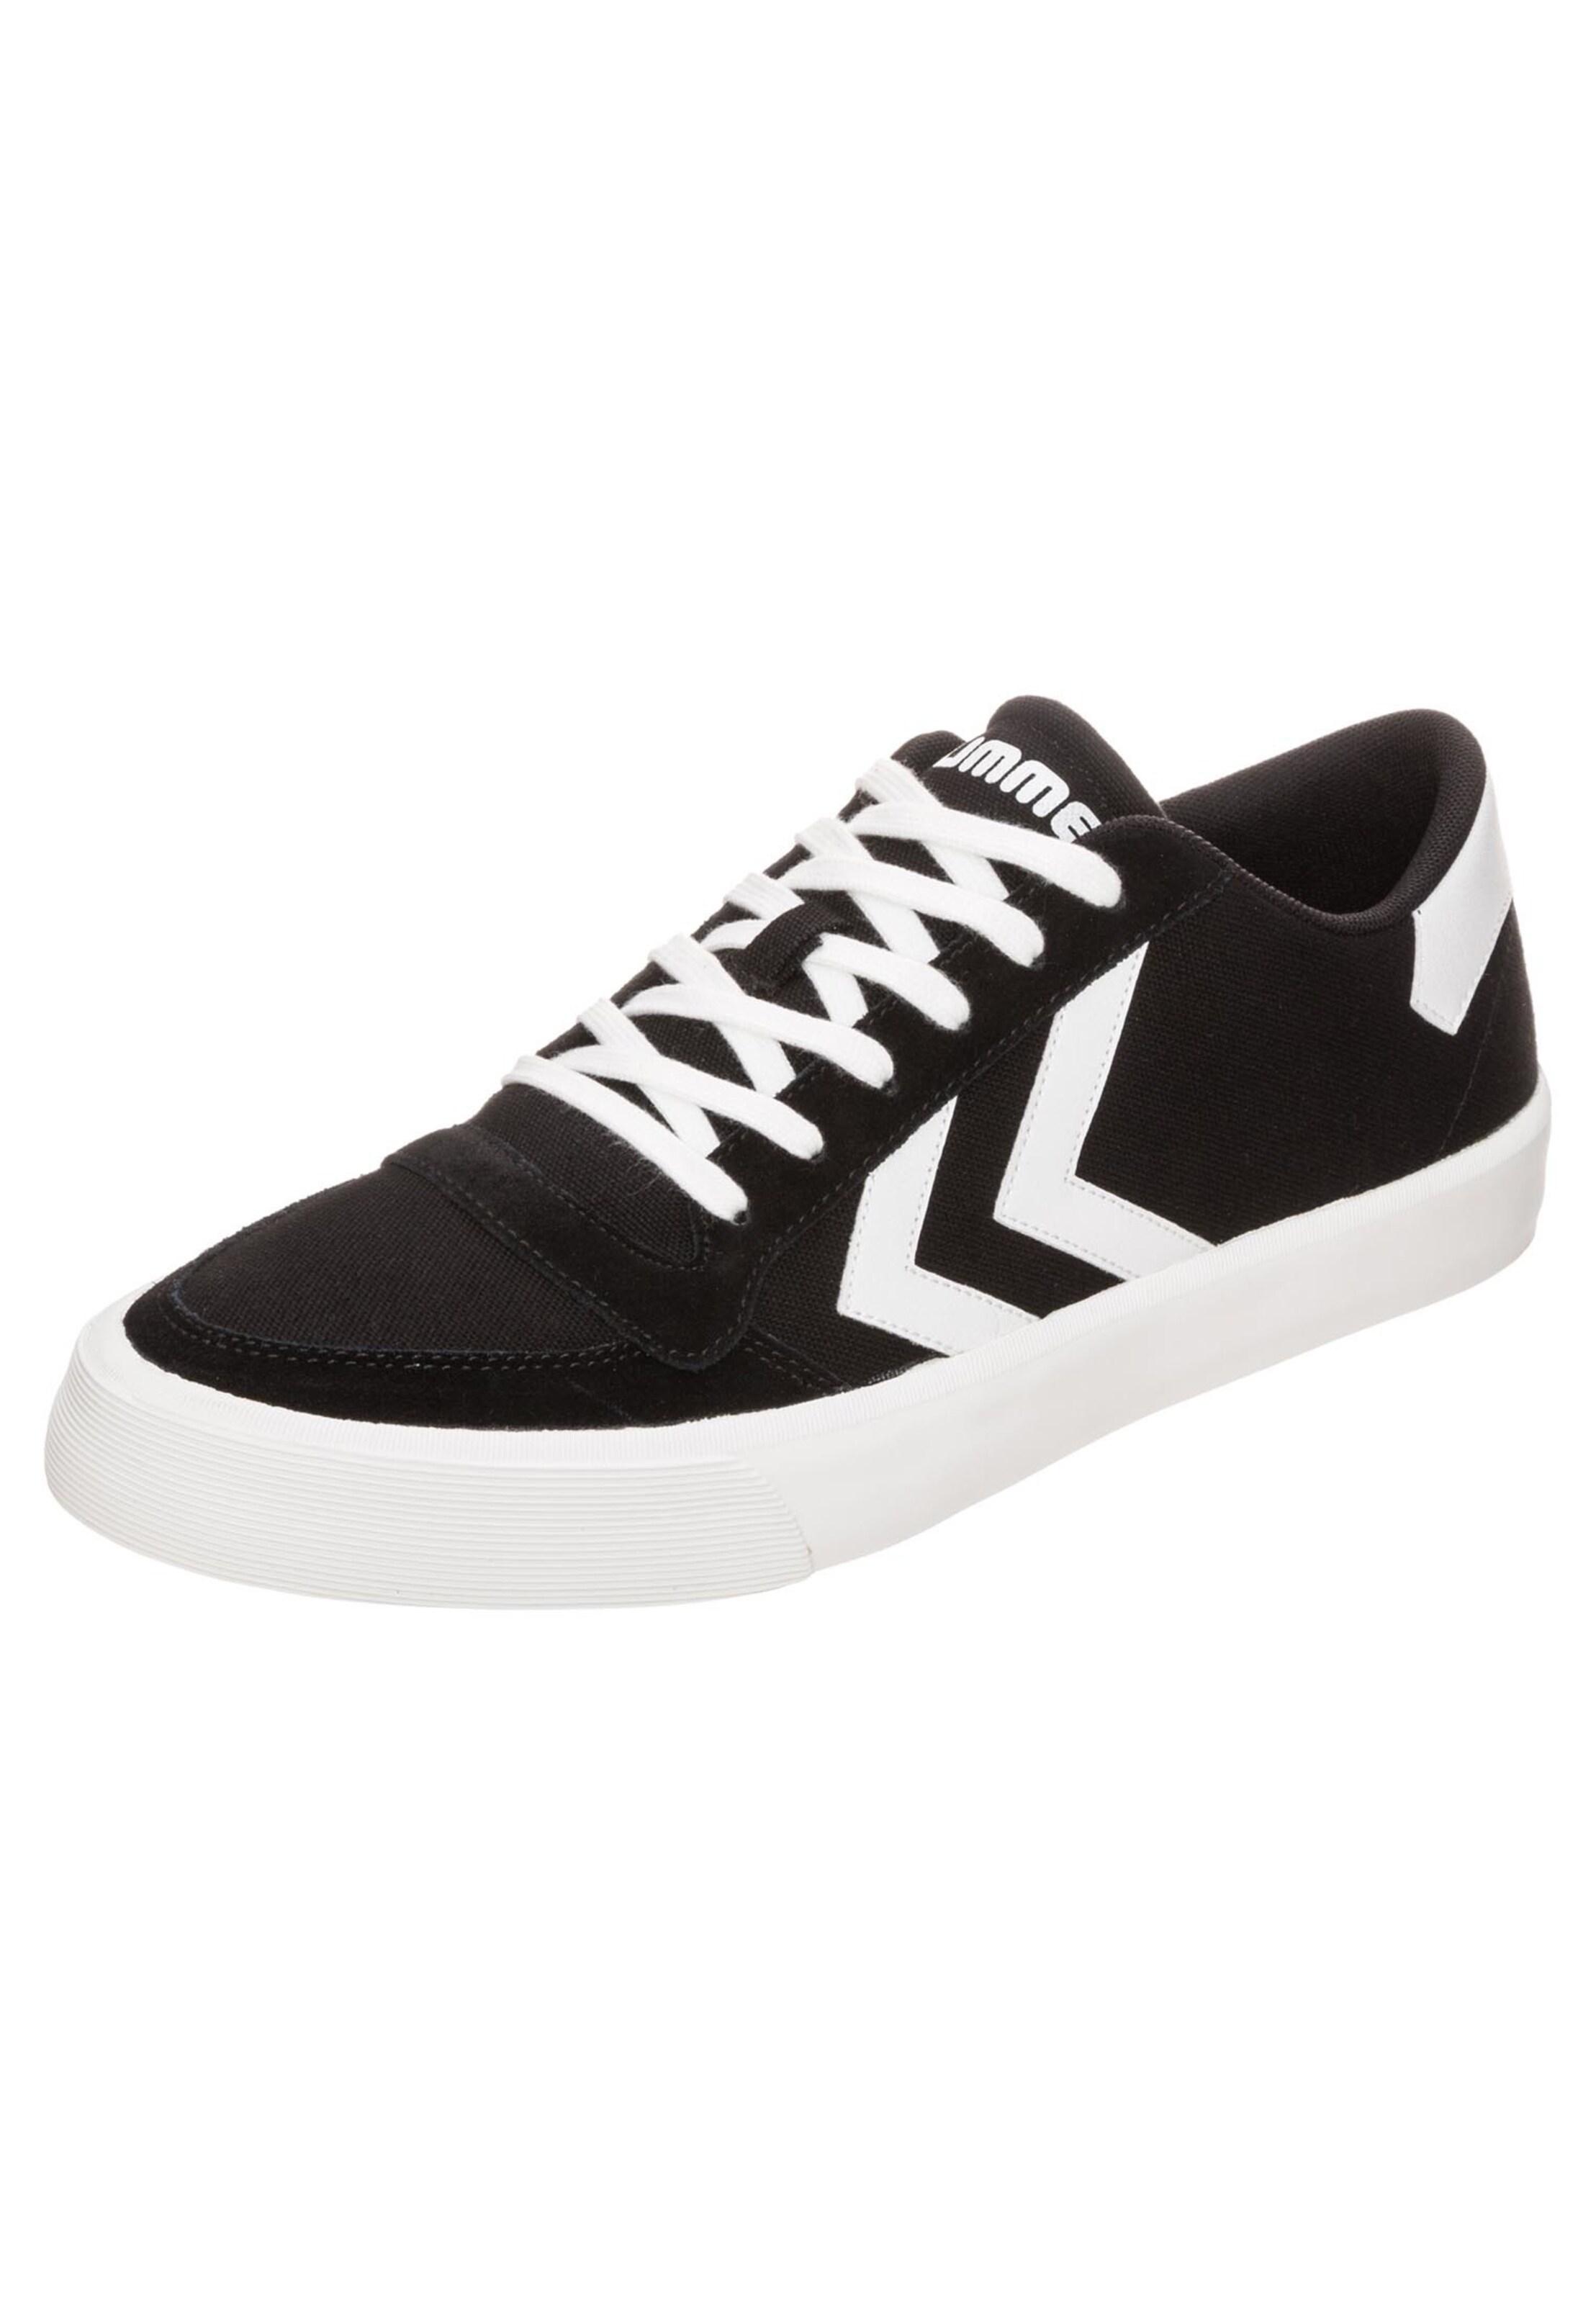 Hummel Sneaker  Stadil RMX Low Low RMX f5c92c